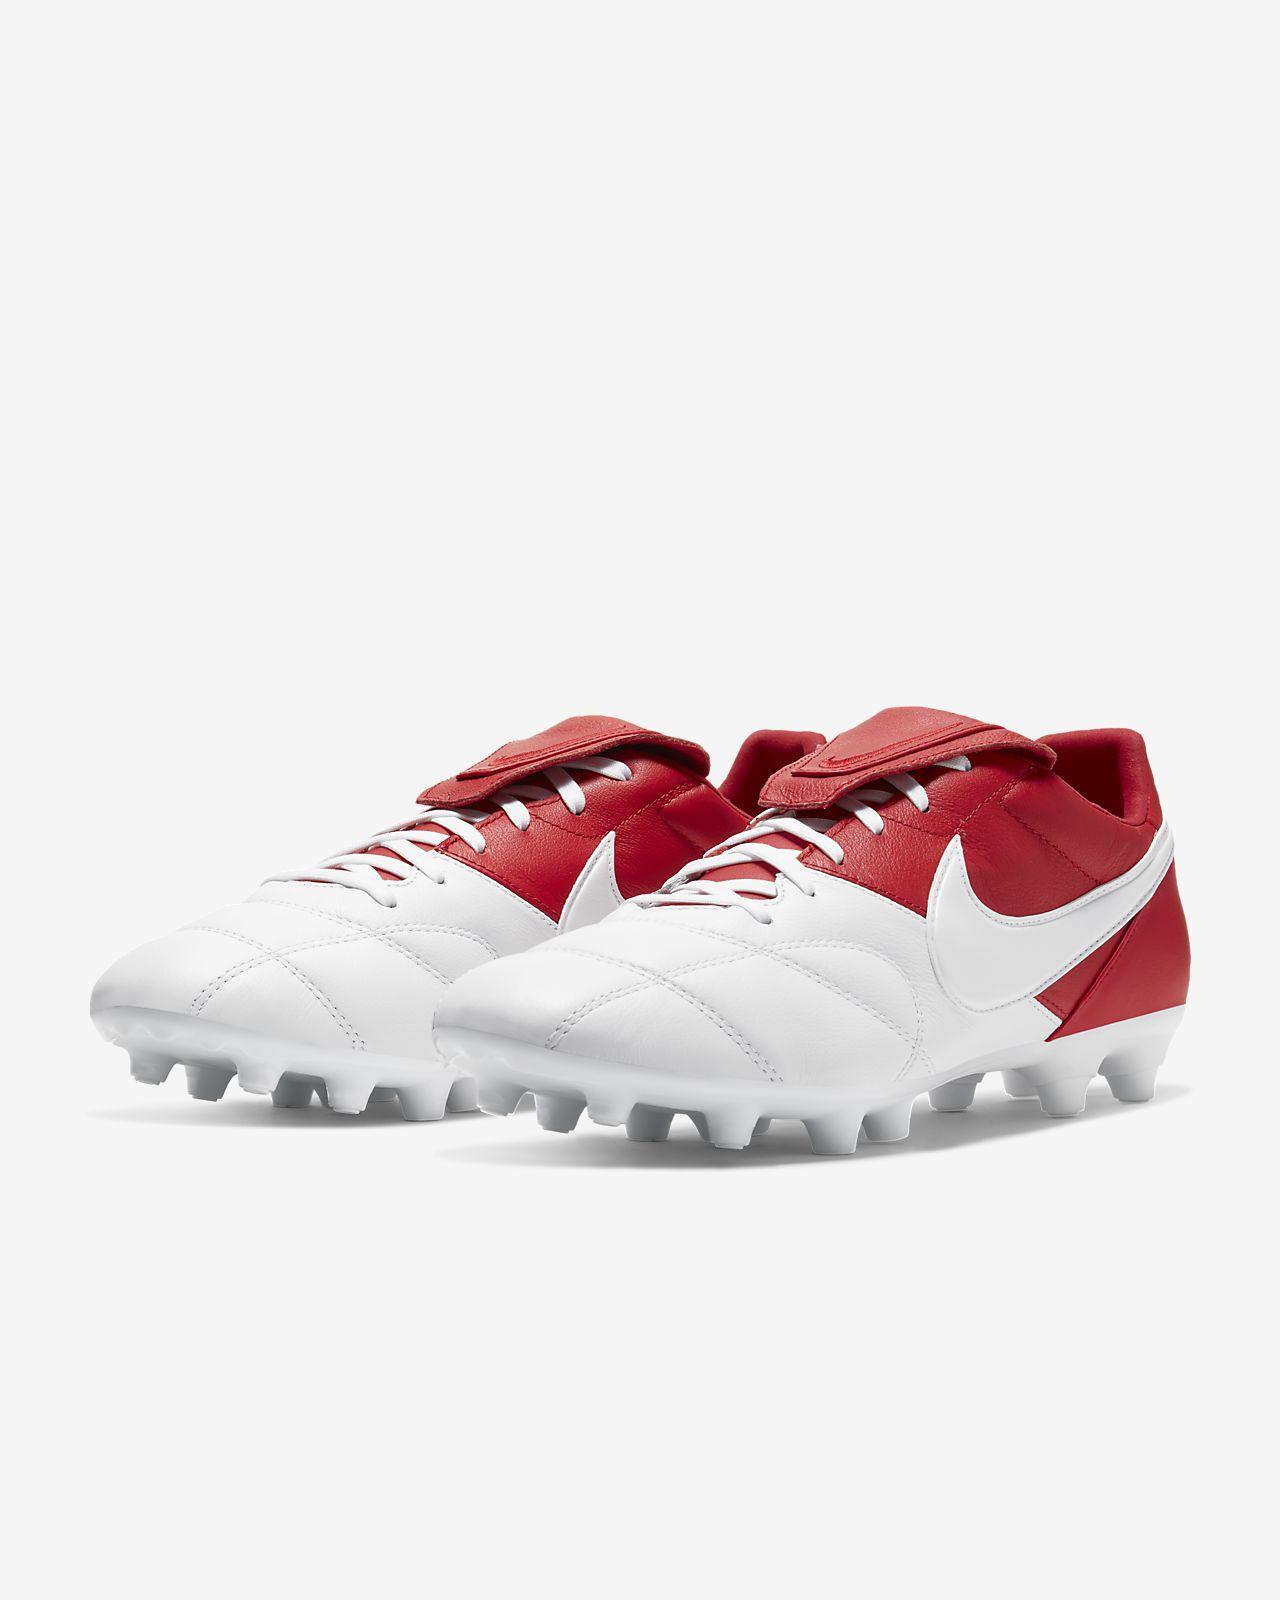 nike premier ii fg red white shoes